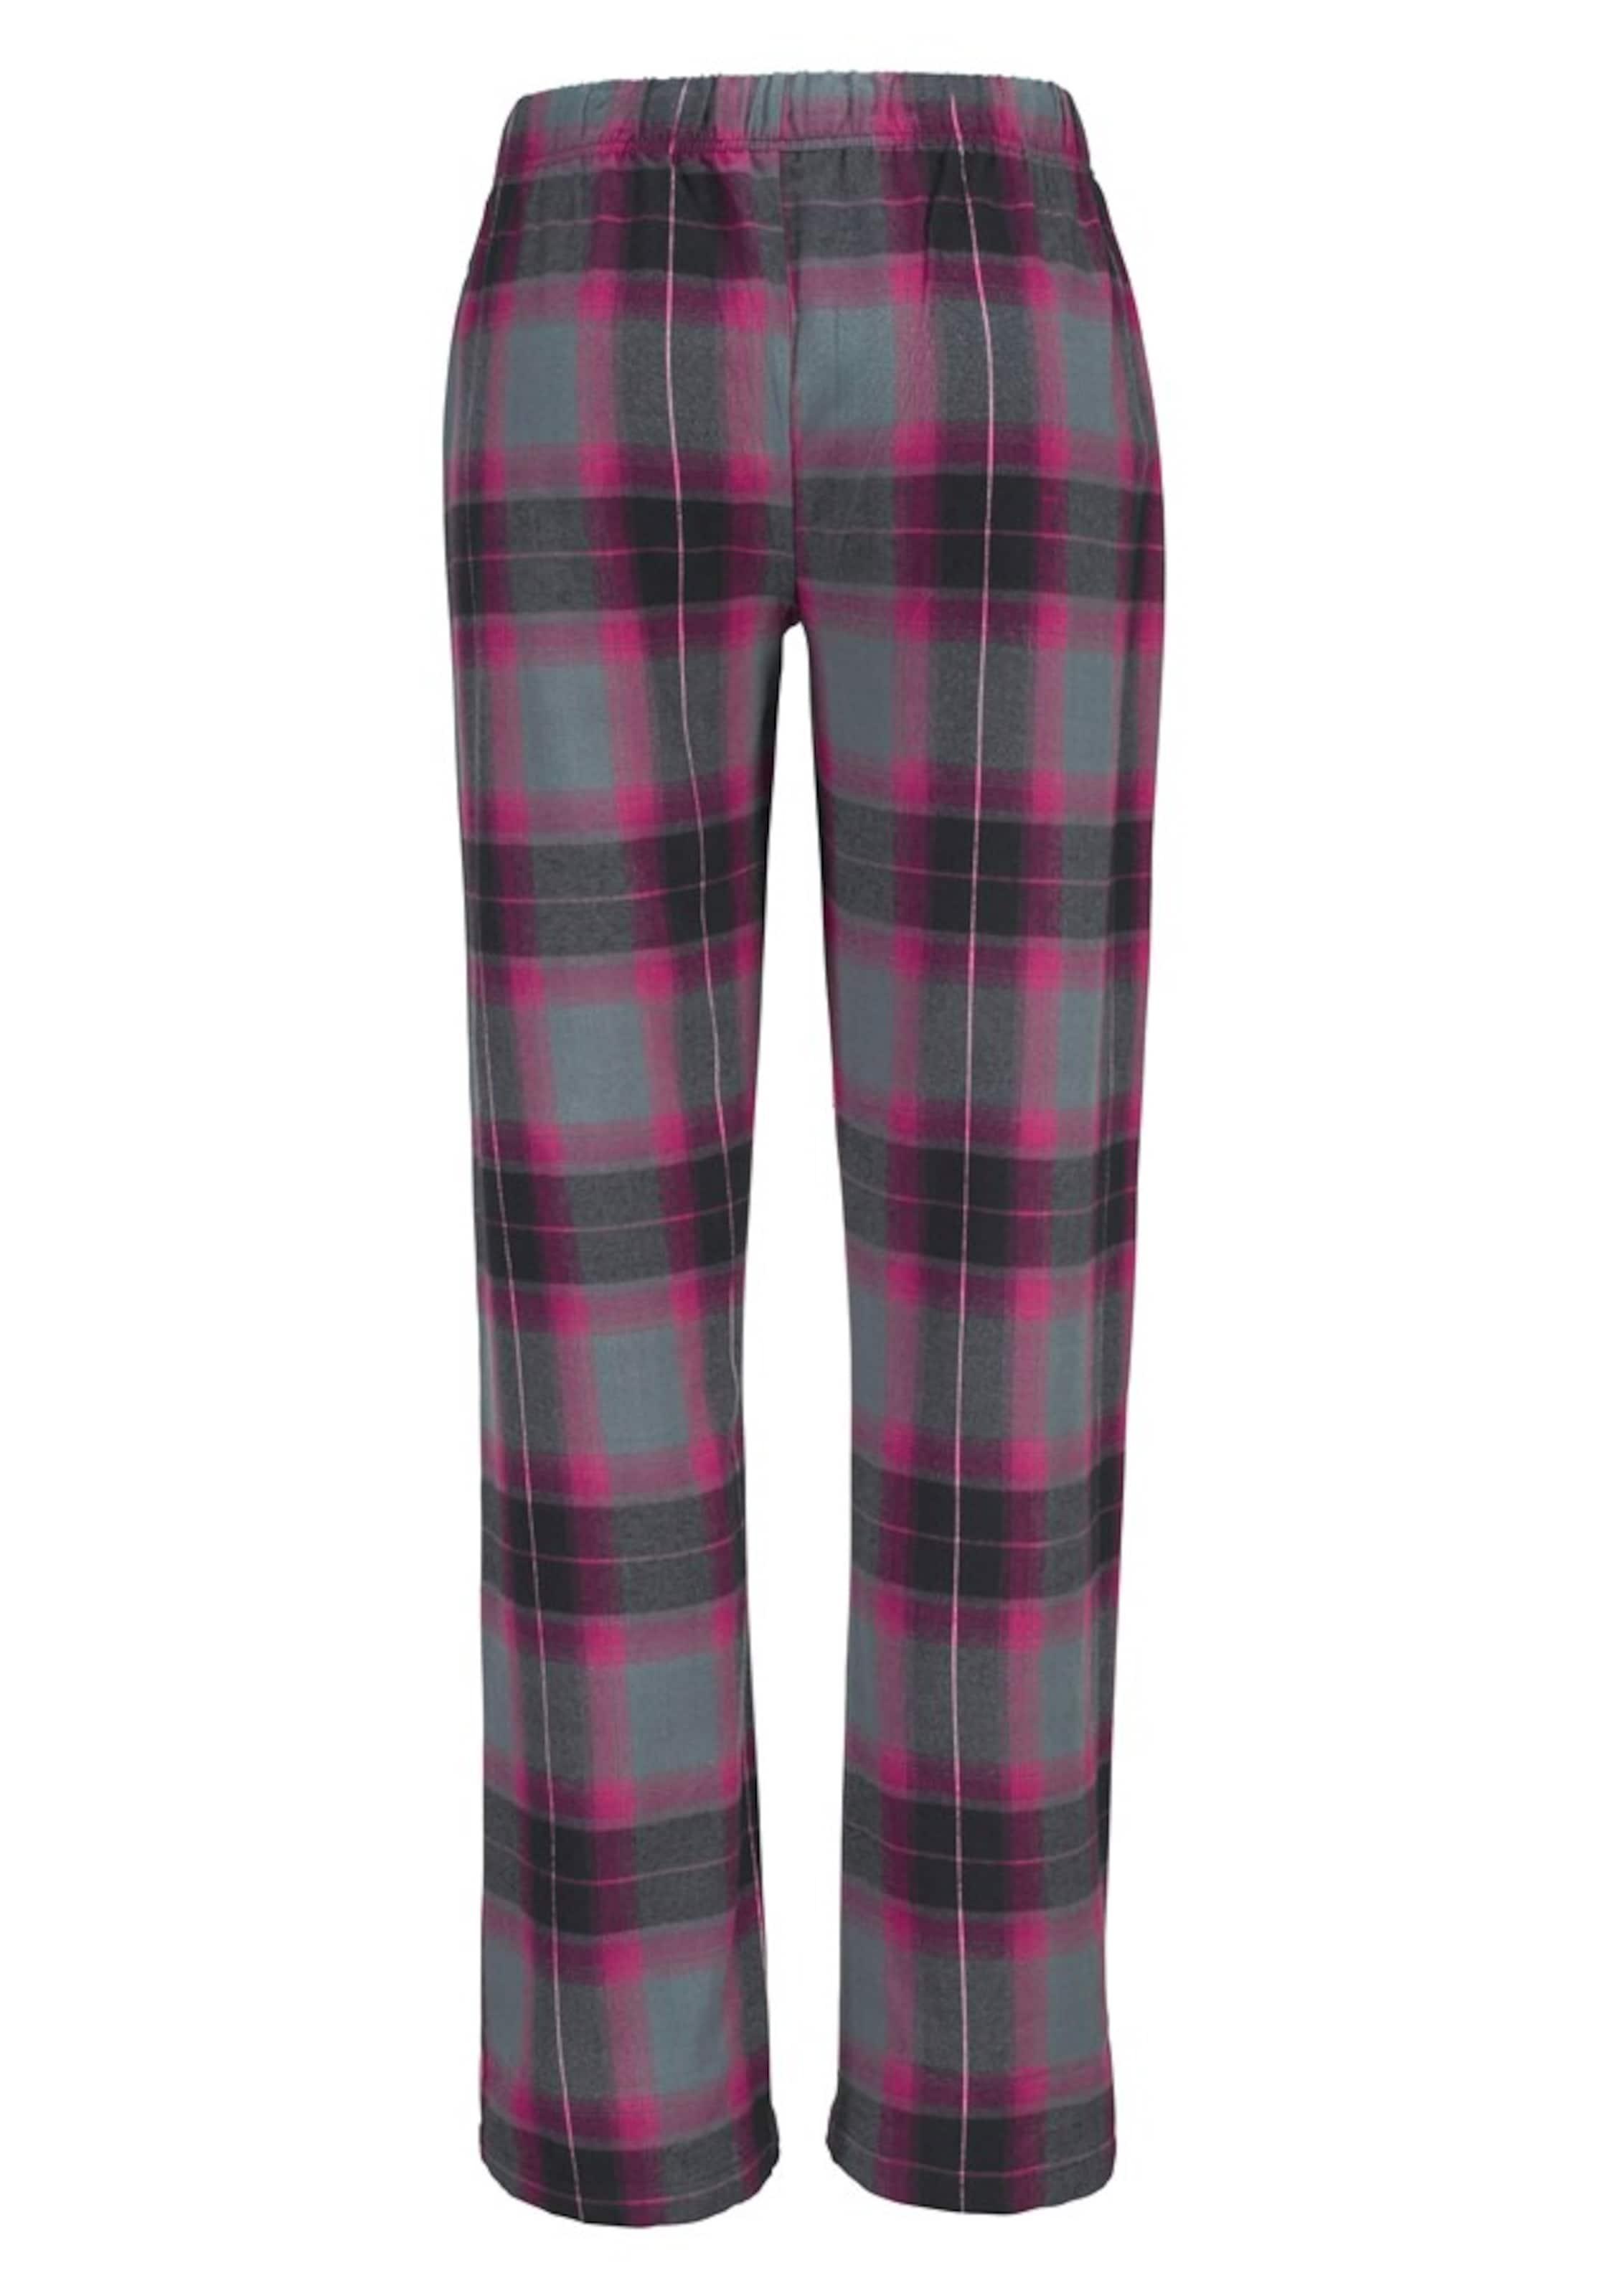 Lascana Noir En Lascana Pyjama GrisViolet En Pyjama GrisViolet 80kPXwNnO